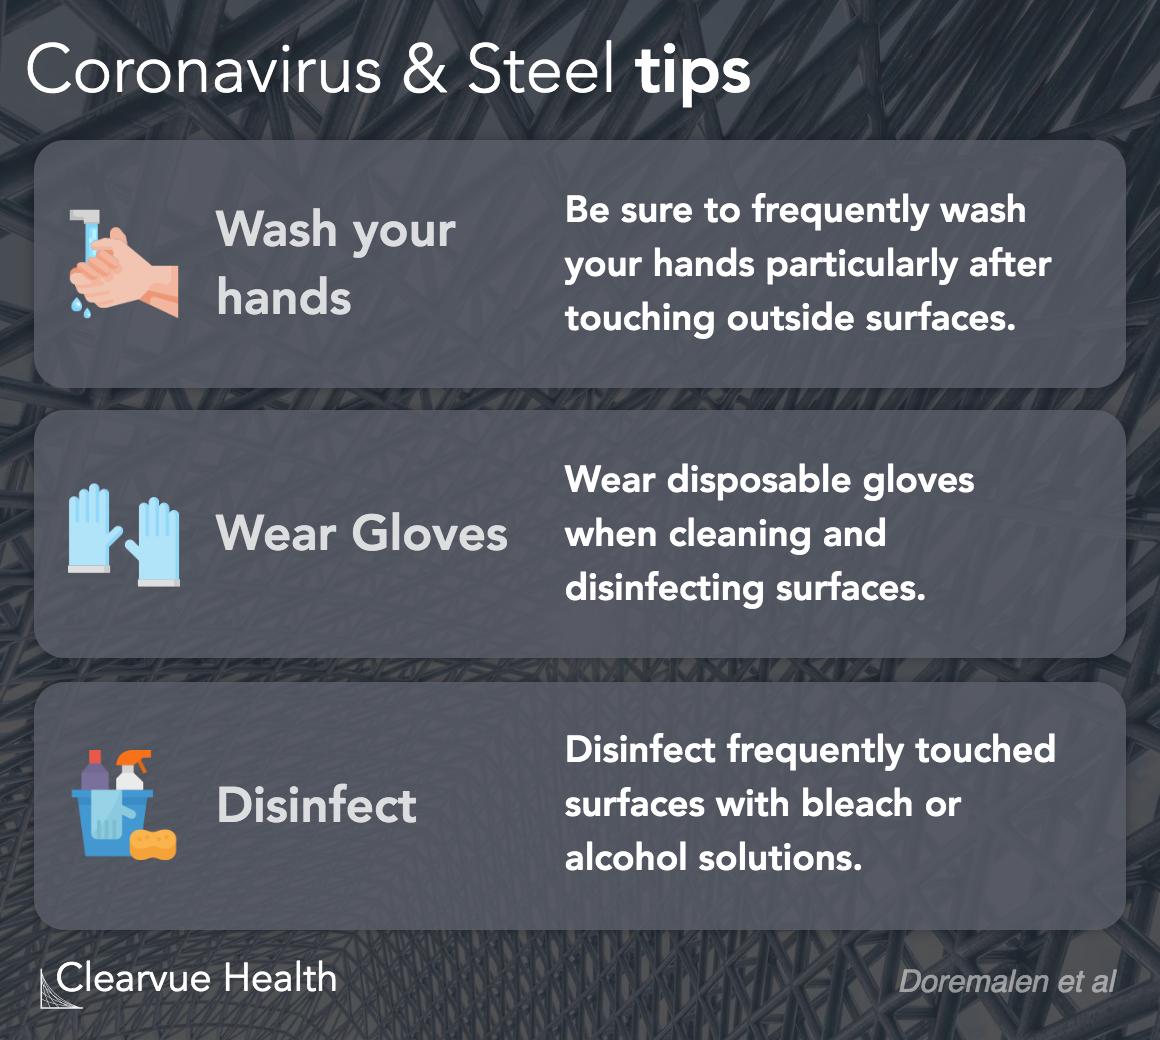 Coronavirus and steel tips